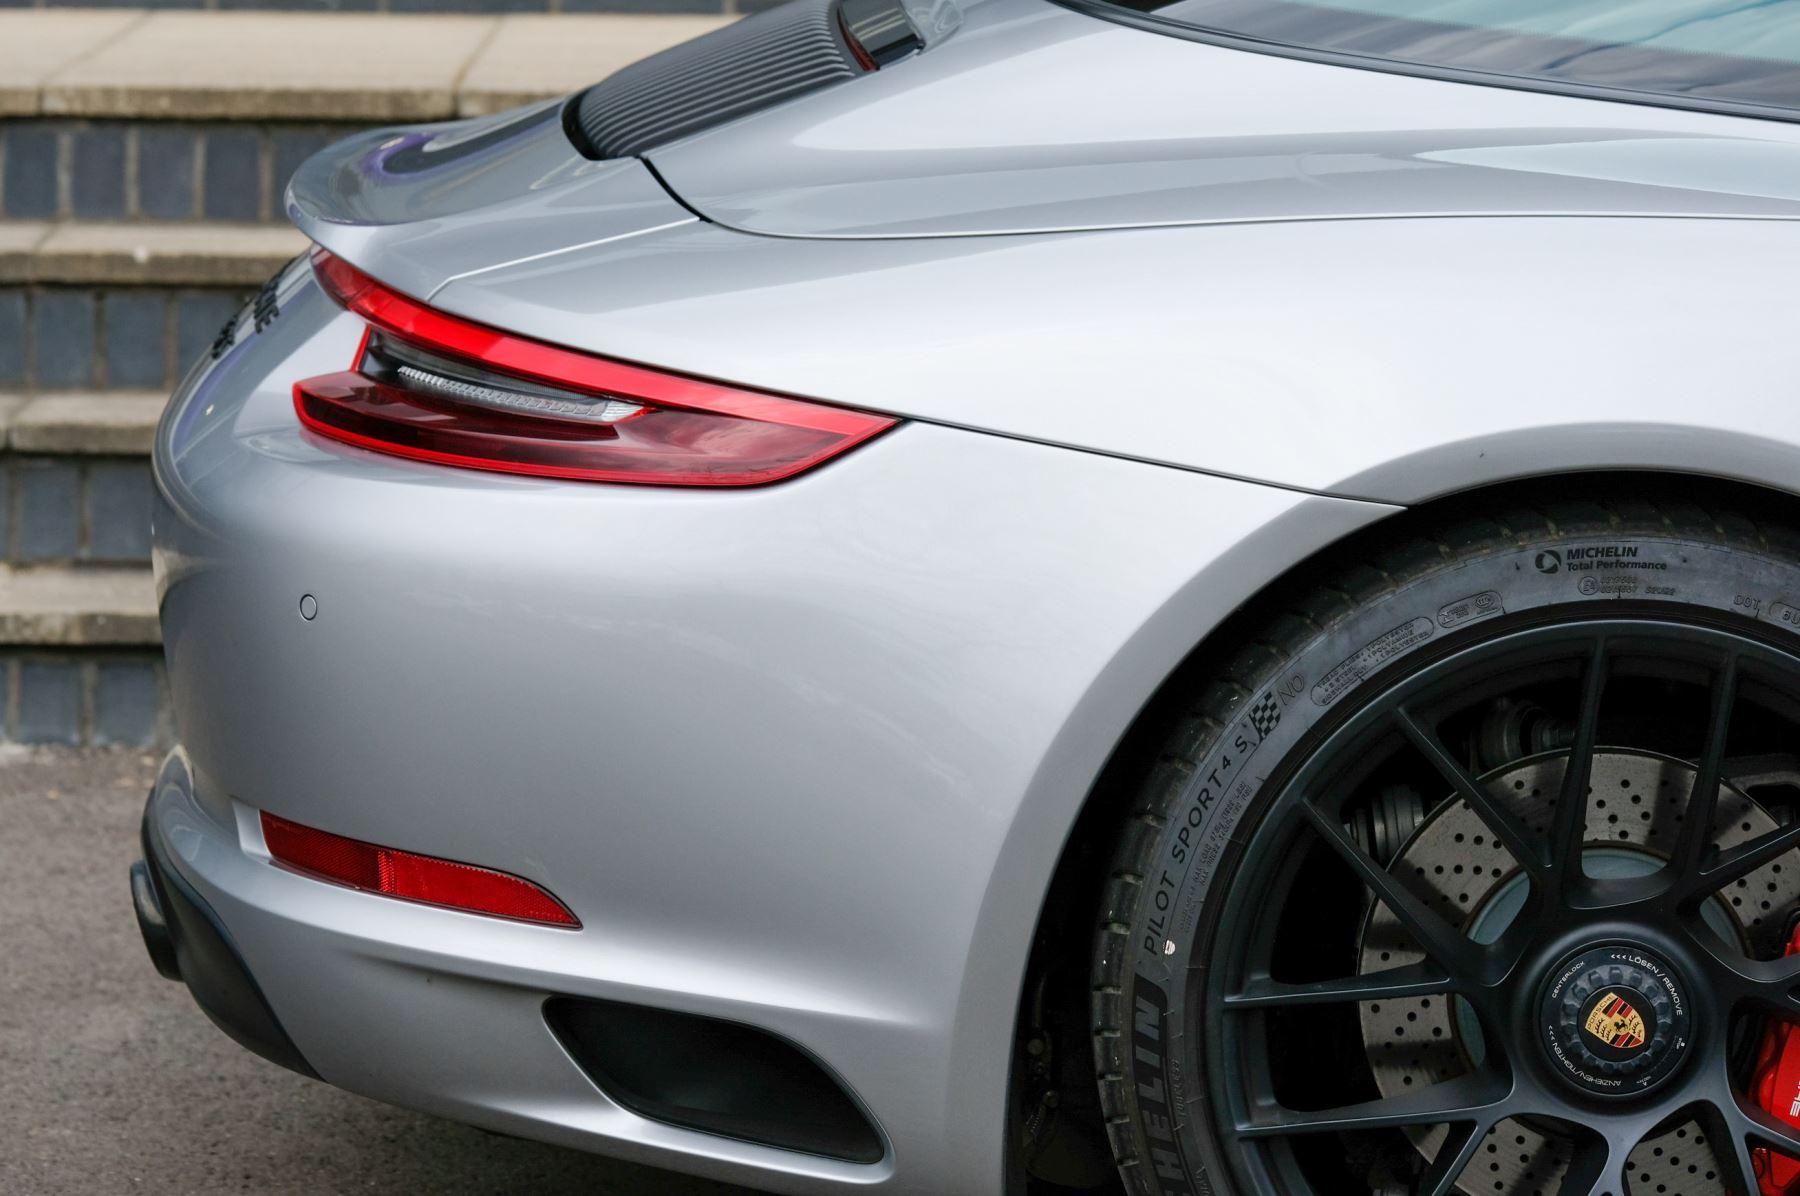 Porsche 911 TARGA 4 GTS - PDK - SPORT DESIGN PACKAGE - GTS INTERIOR PACKAGE image 10